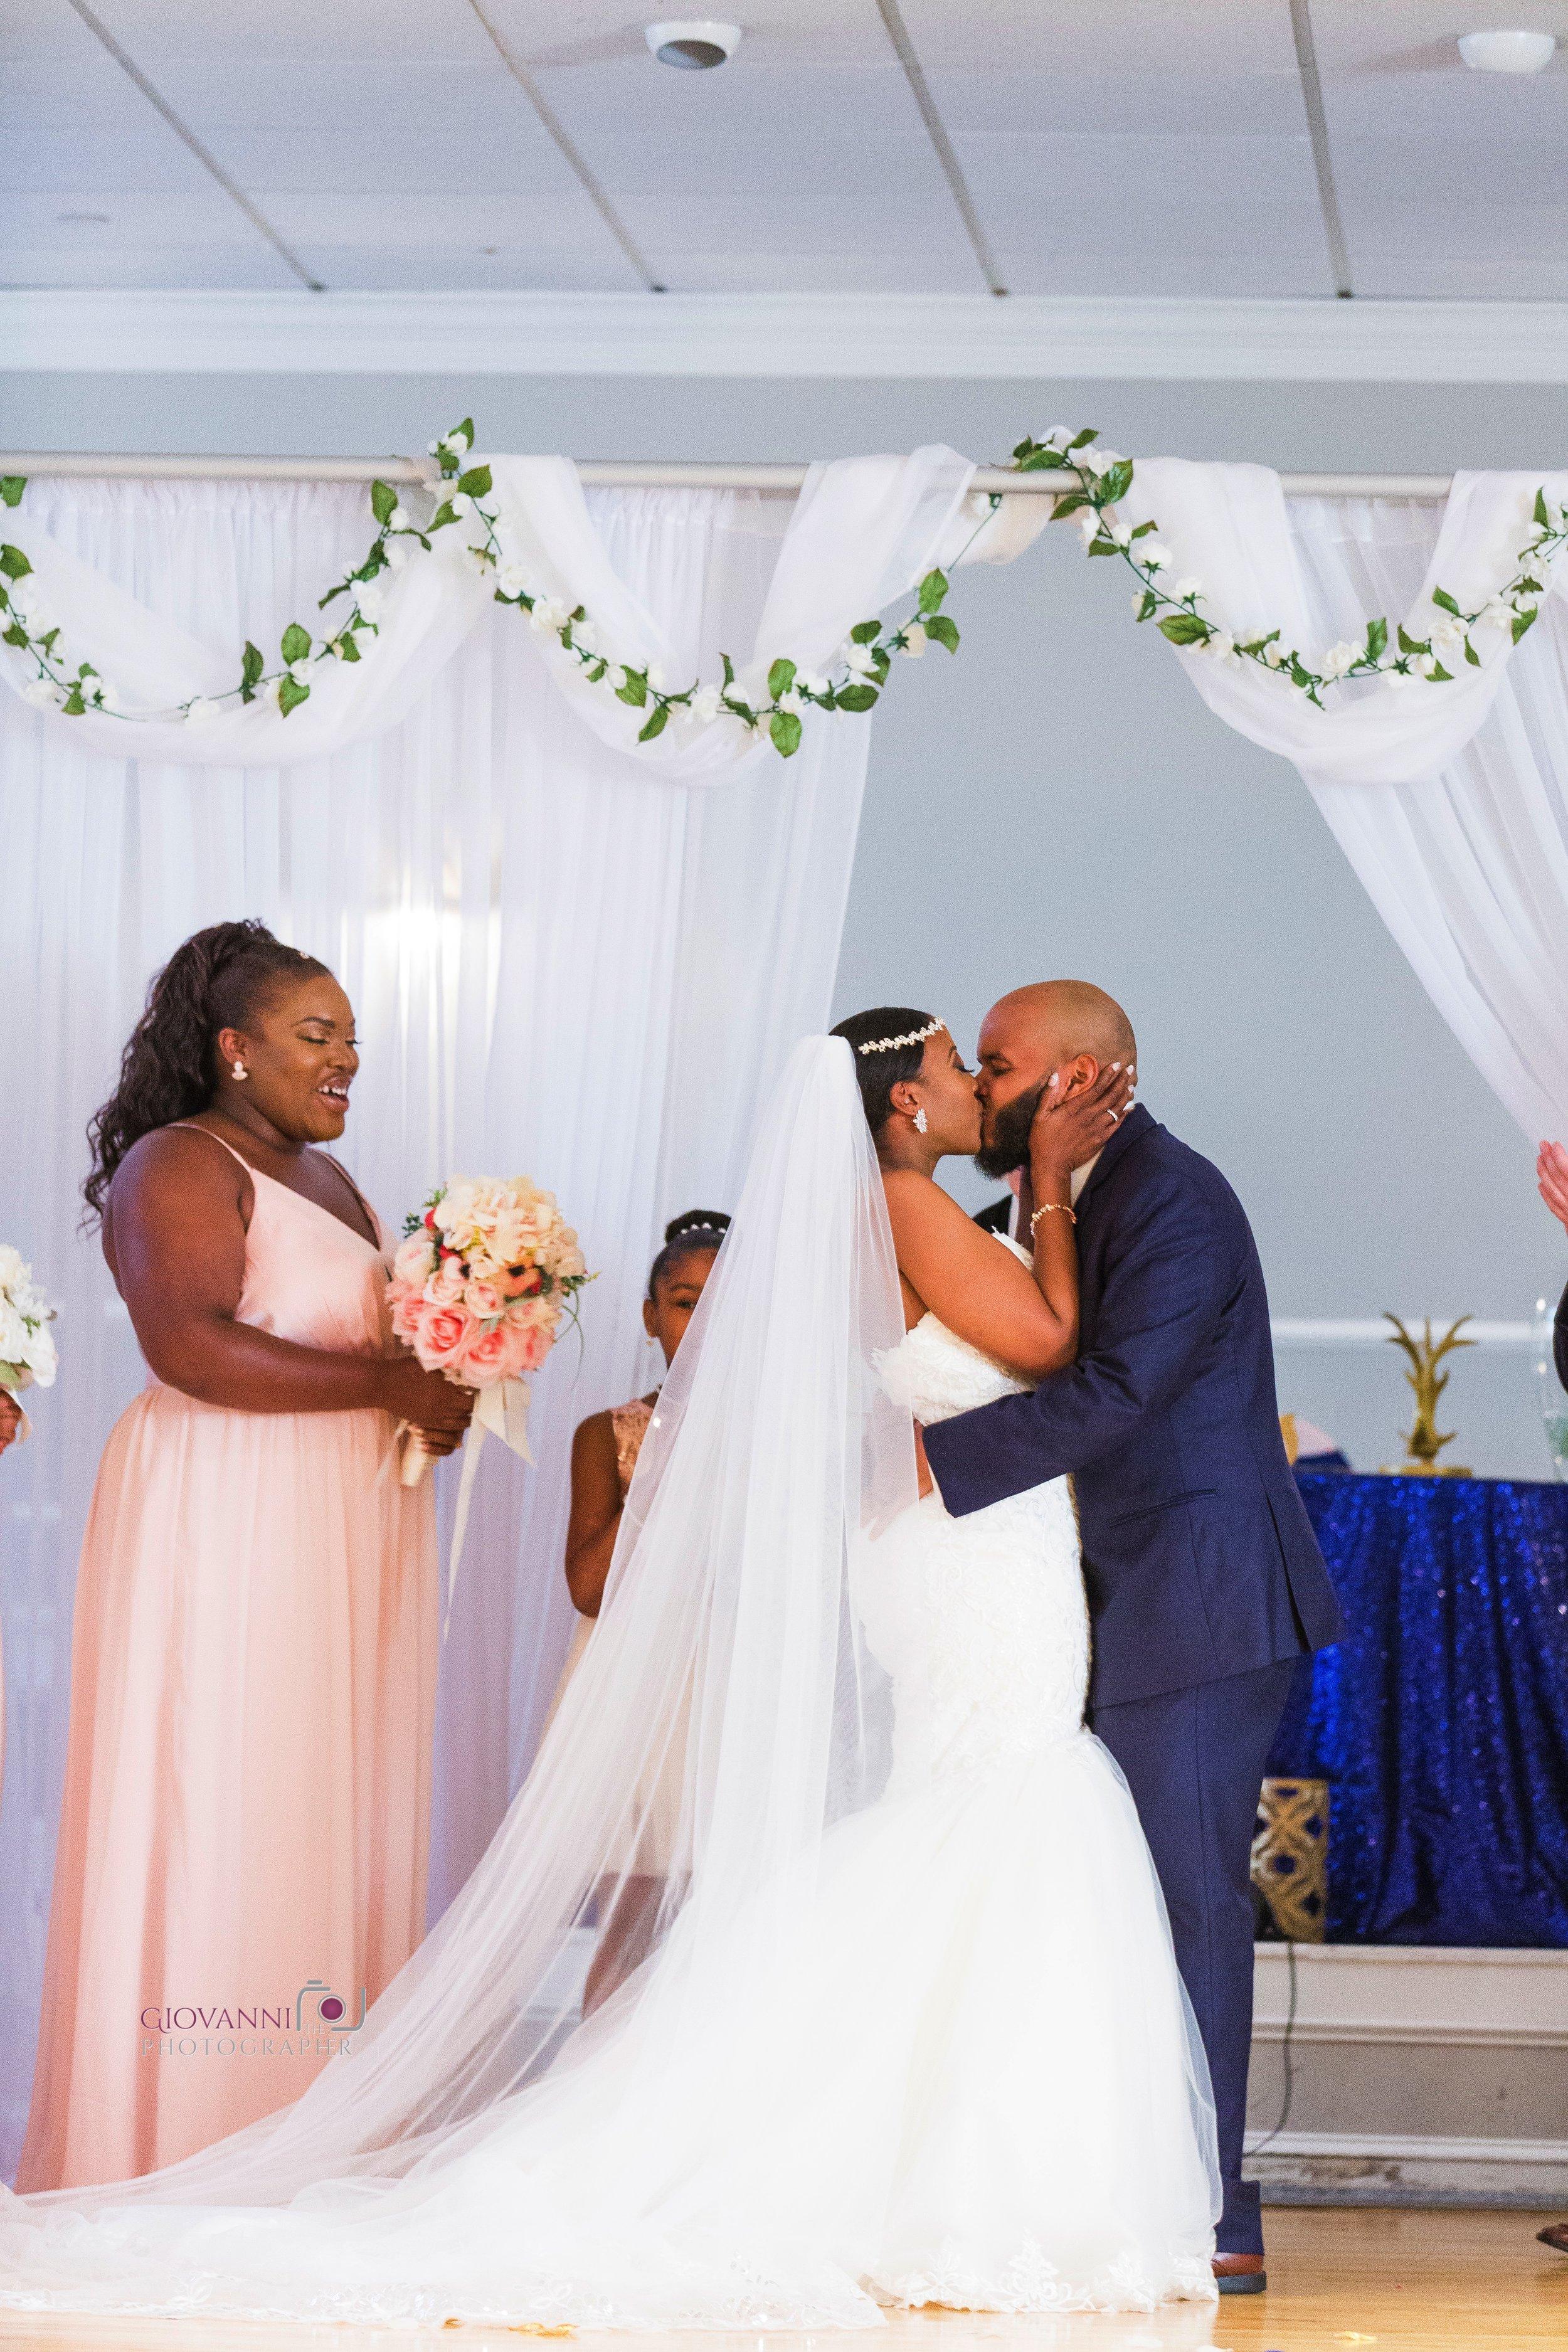 314A0716-Giovanni The Photographer-Best Boston Wedding Photography-Randolph Elks 2130 WM50.jpg